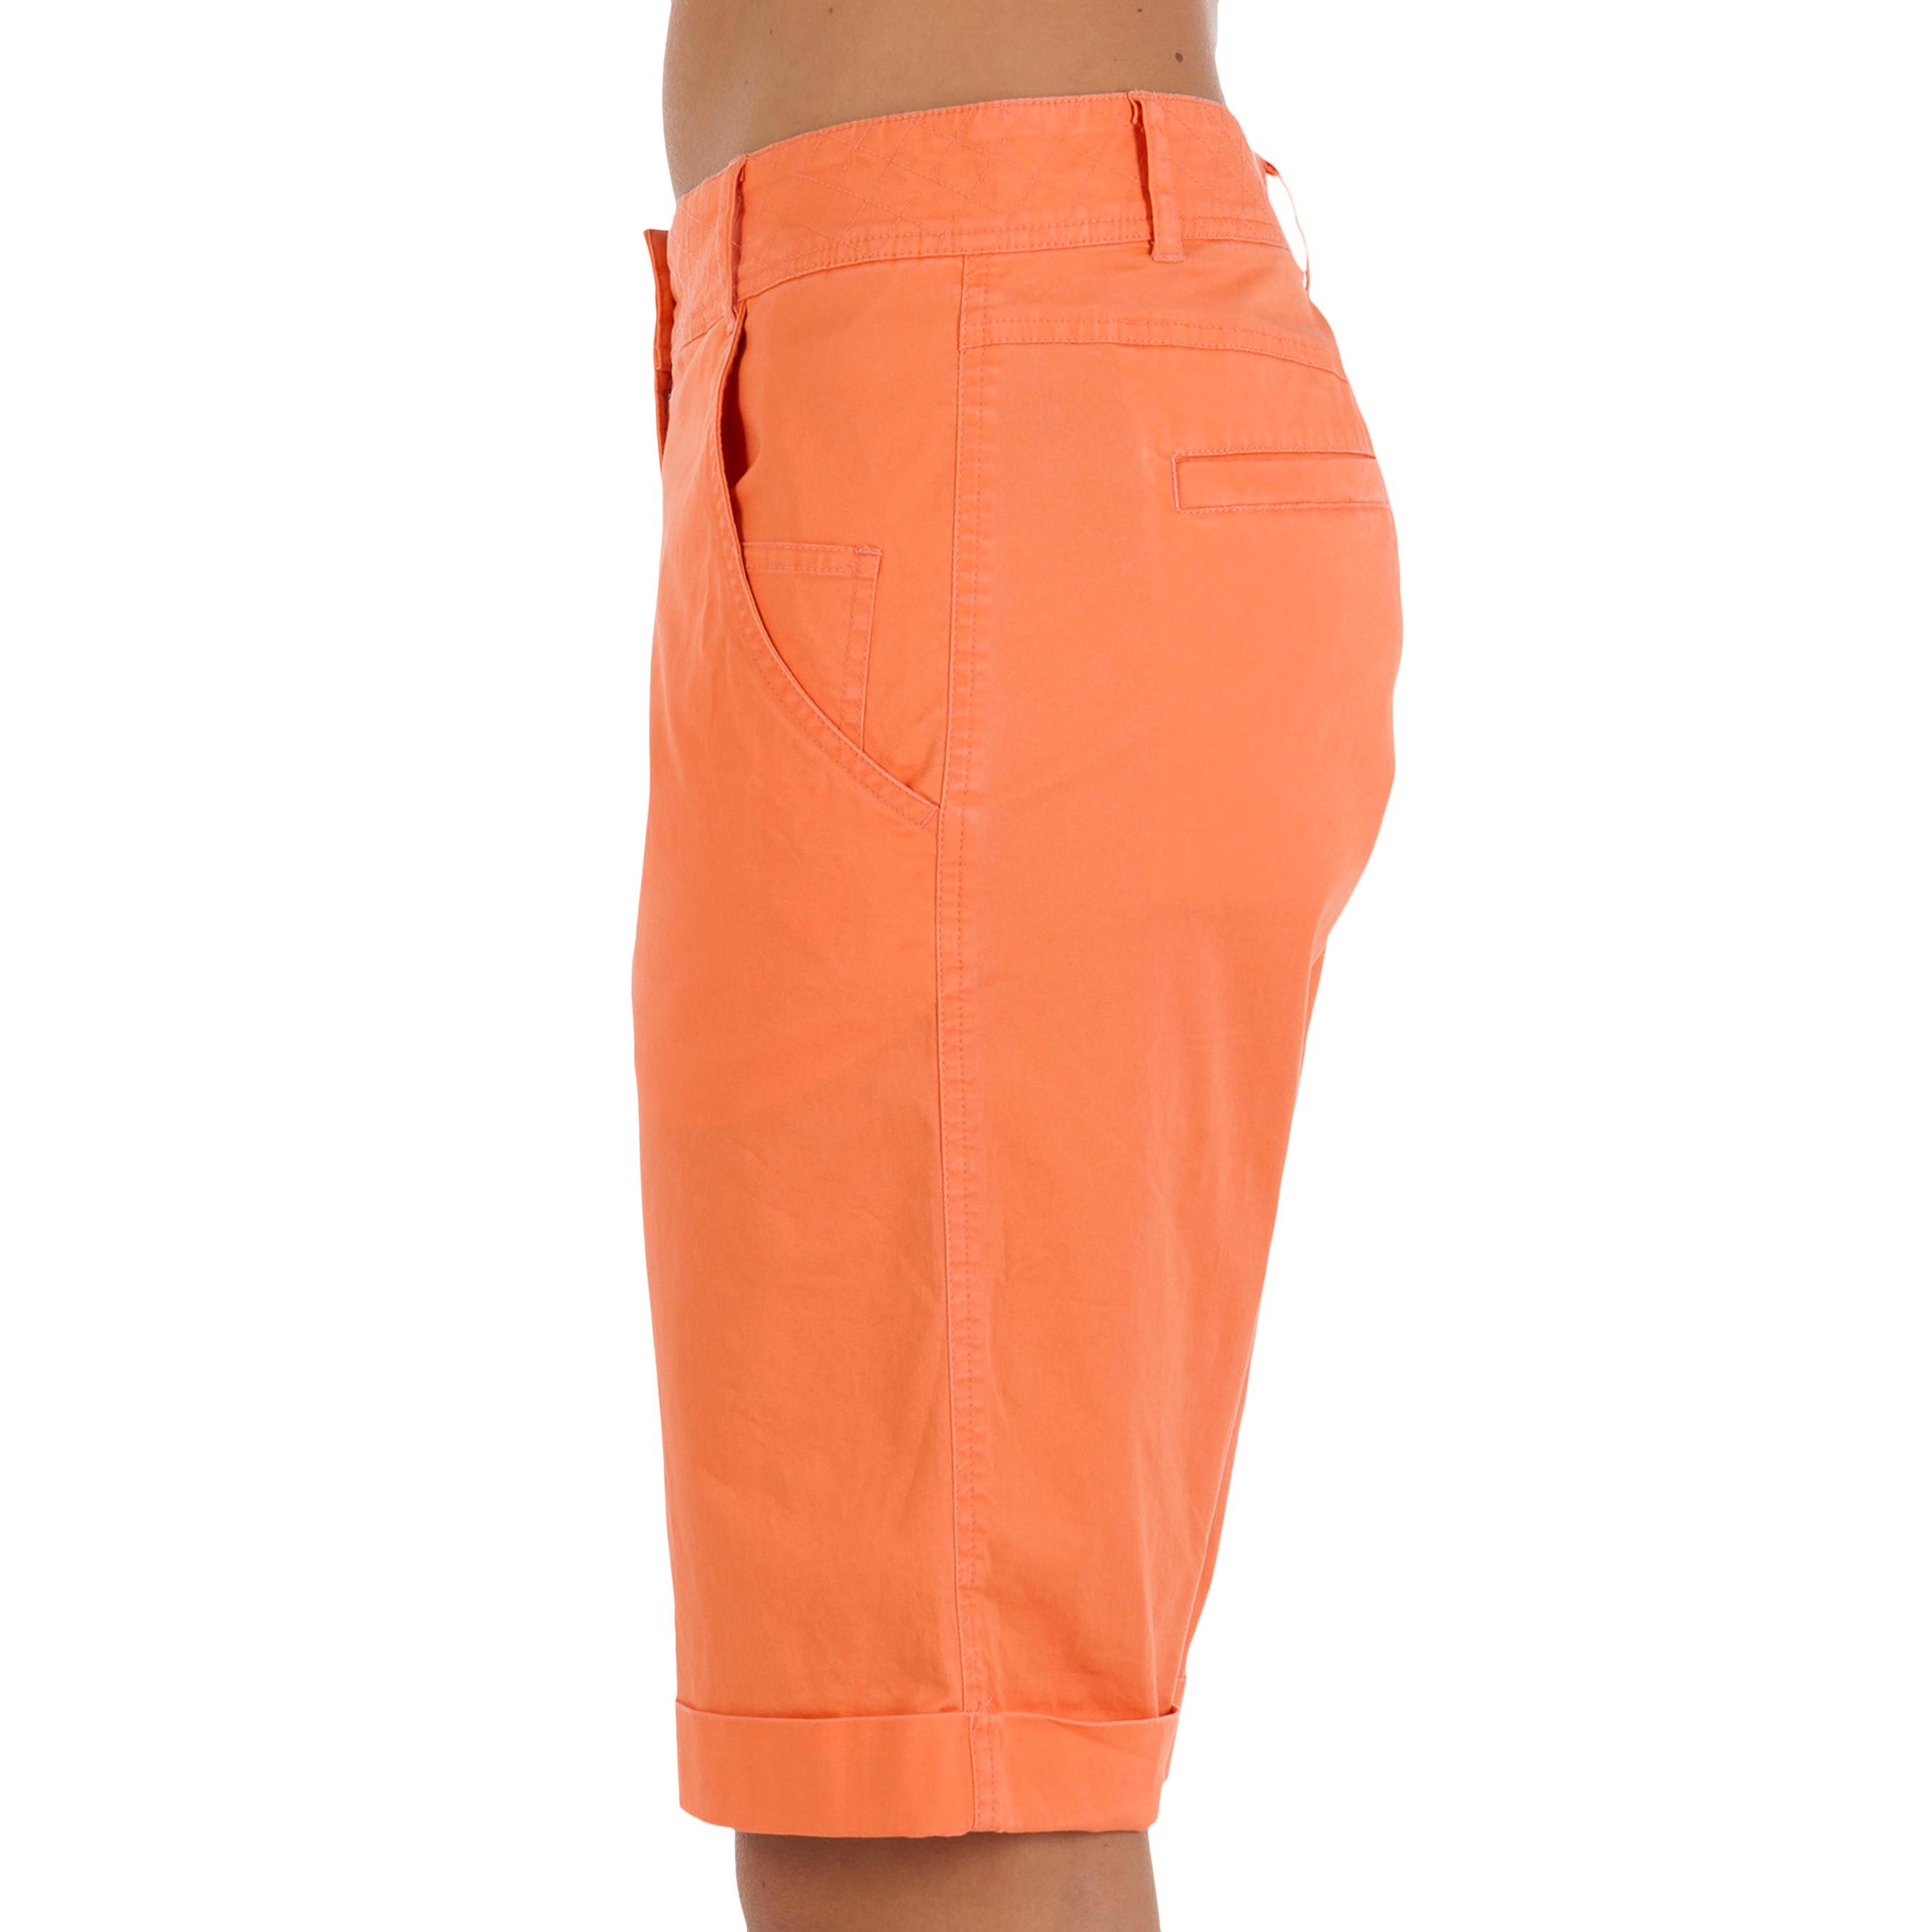 Bermuda Orange Femme Corail Anti Upf 40 Uv zMUqVSGp